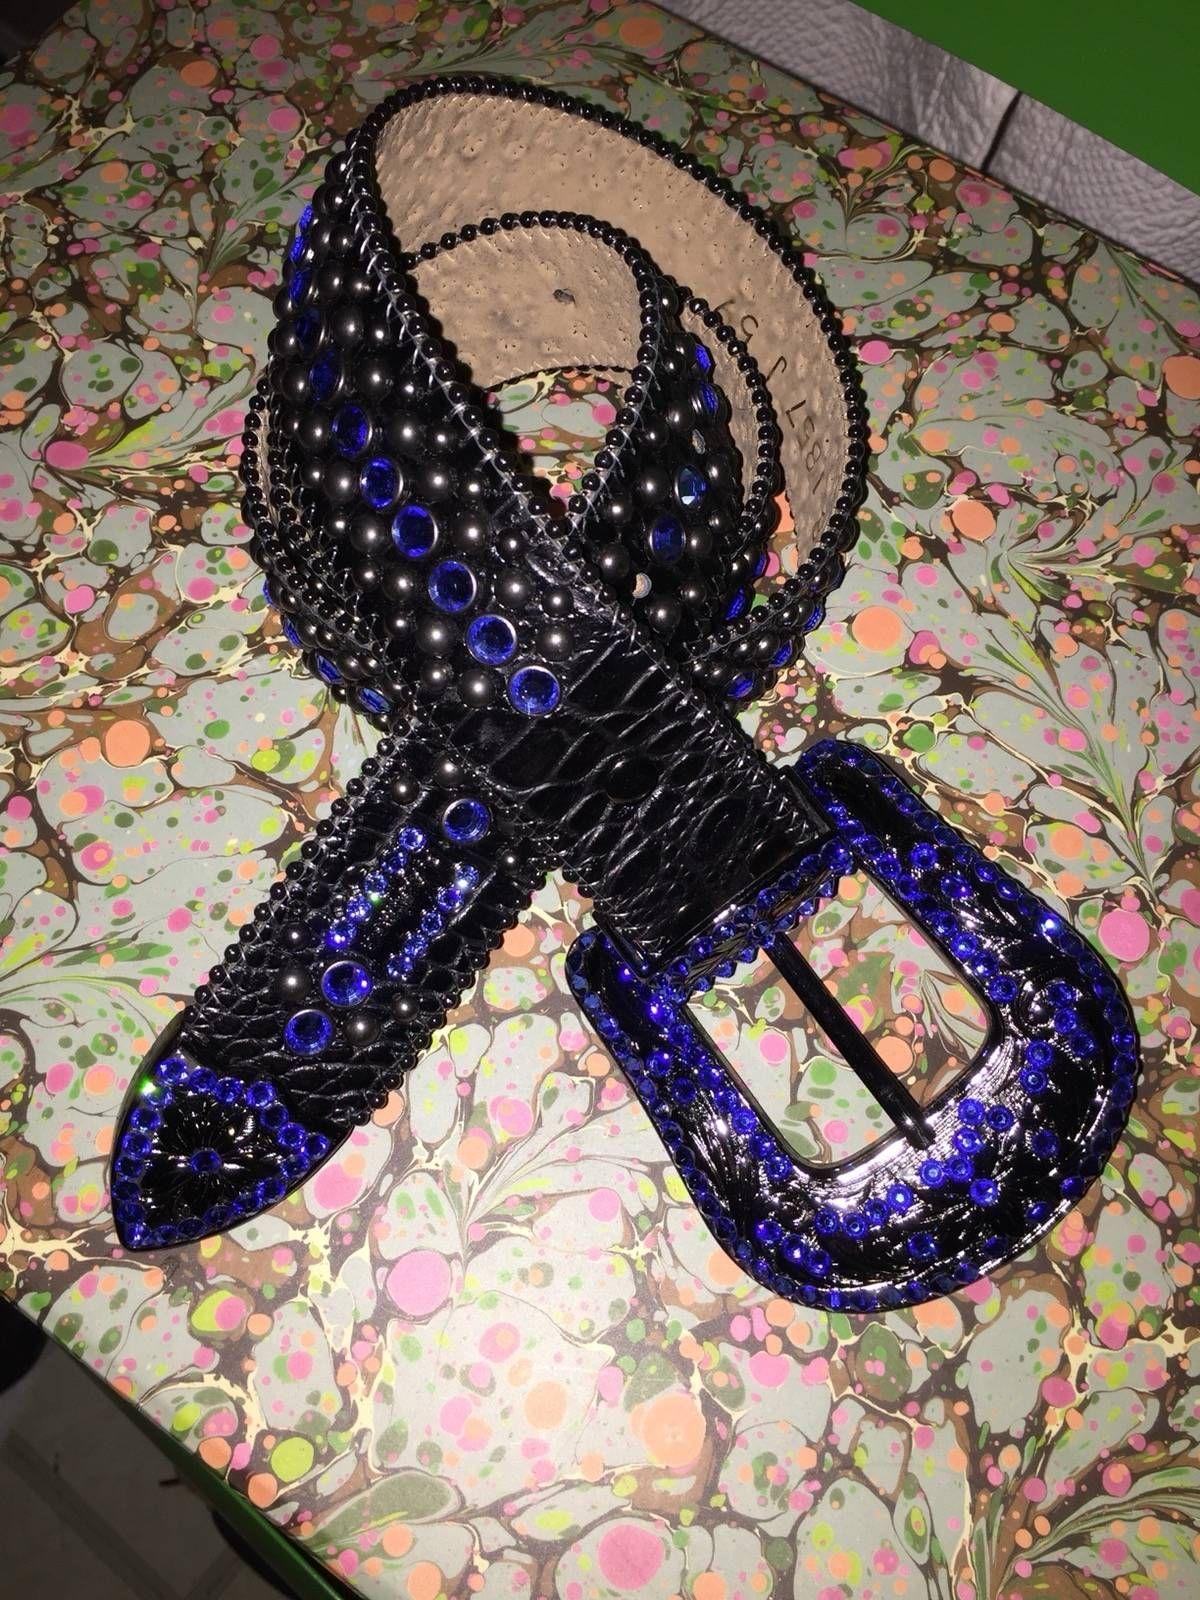 71f02c1444b7 Buy B.B. Simons B.B Simons Swarovski Sapphire Belt 1 1 Custom Belt Size 38  100